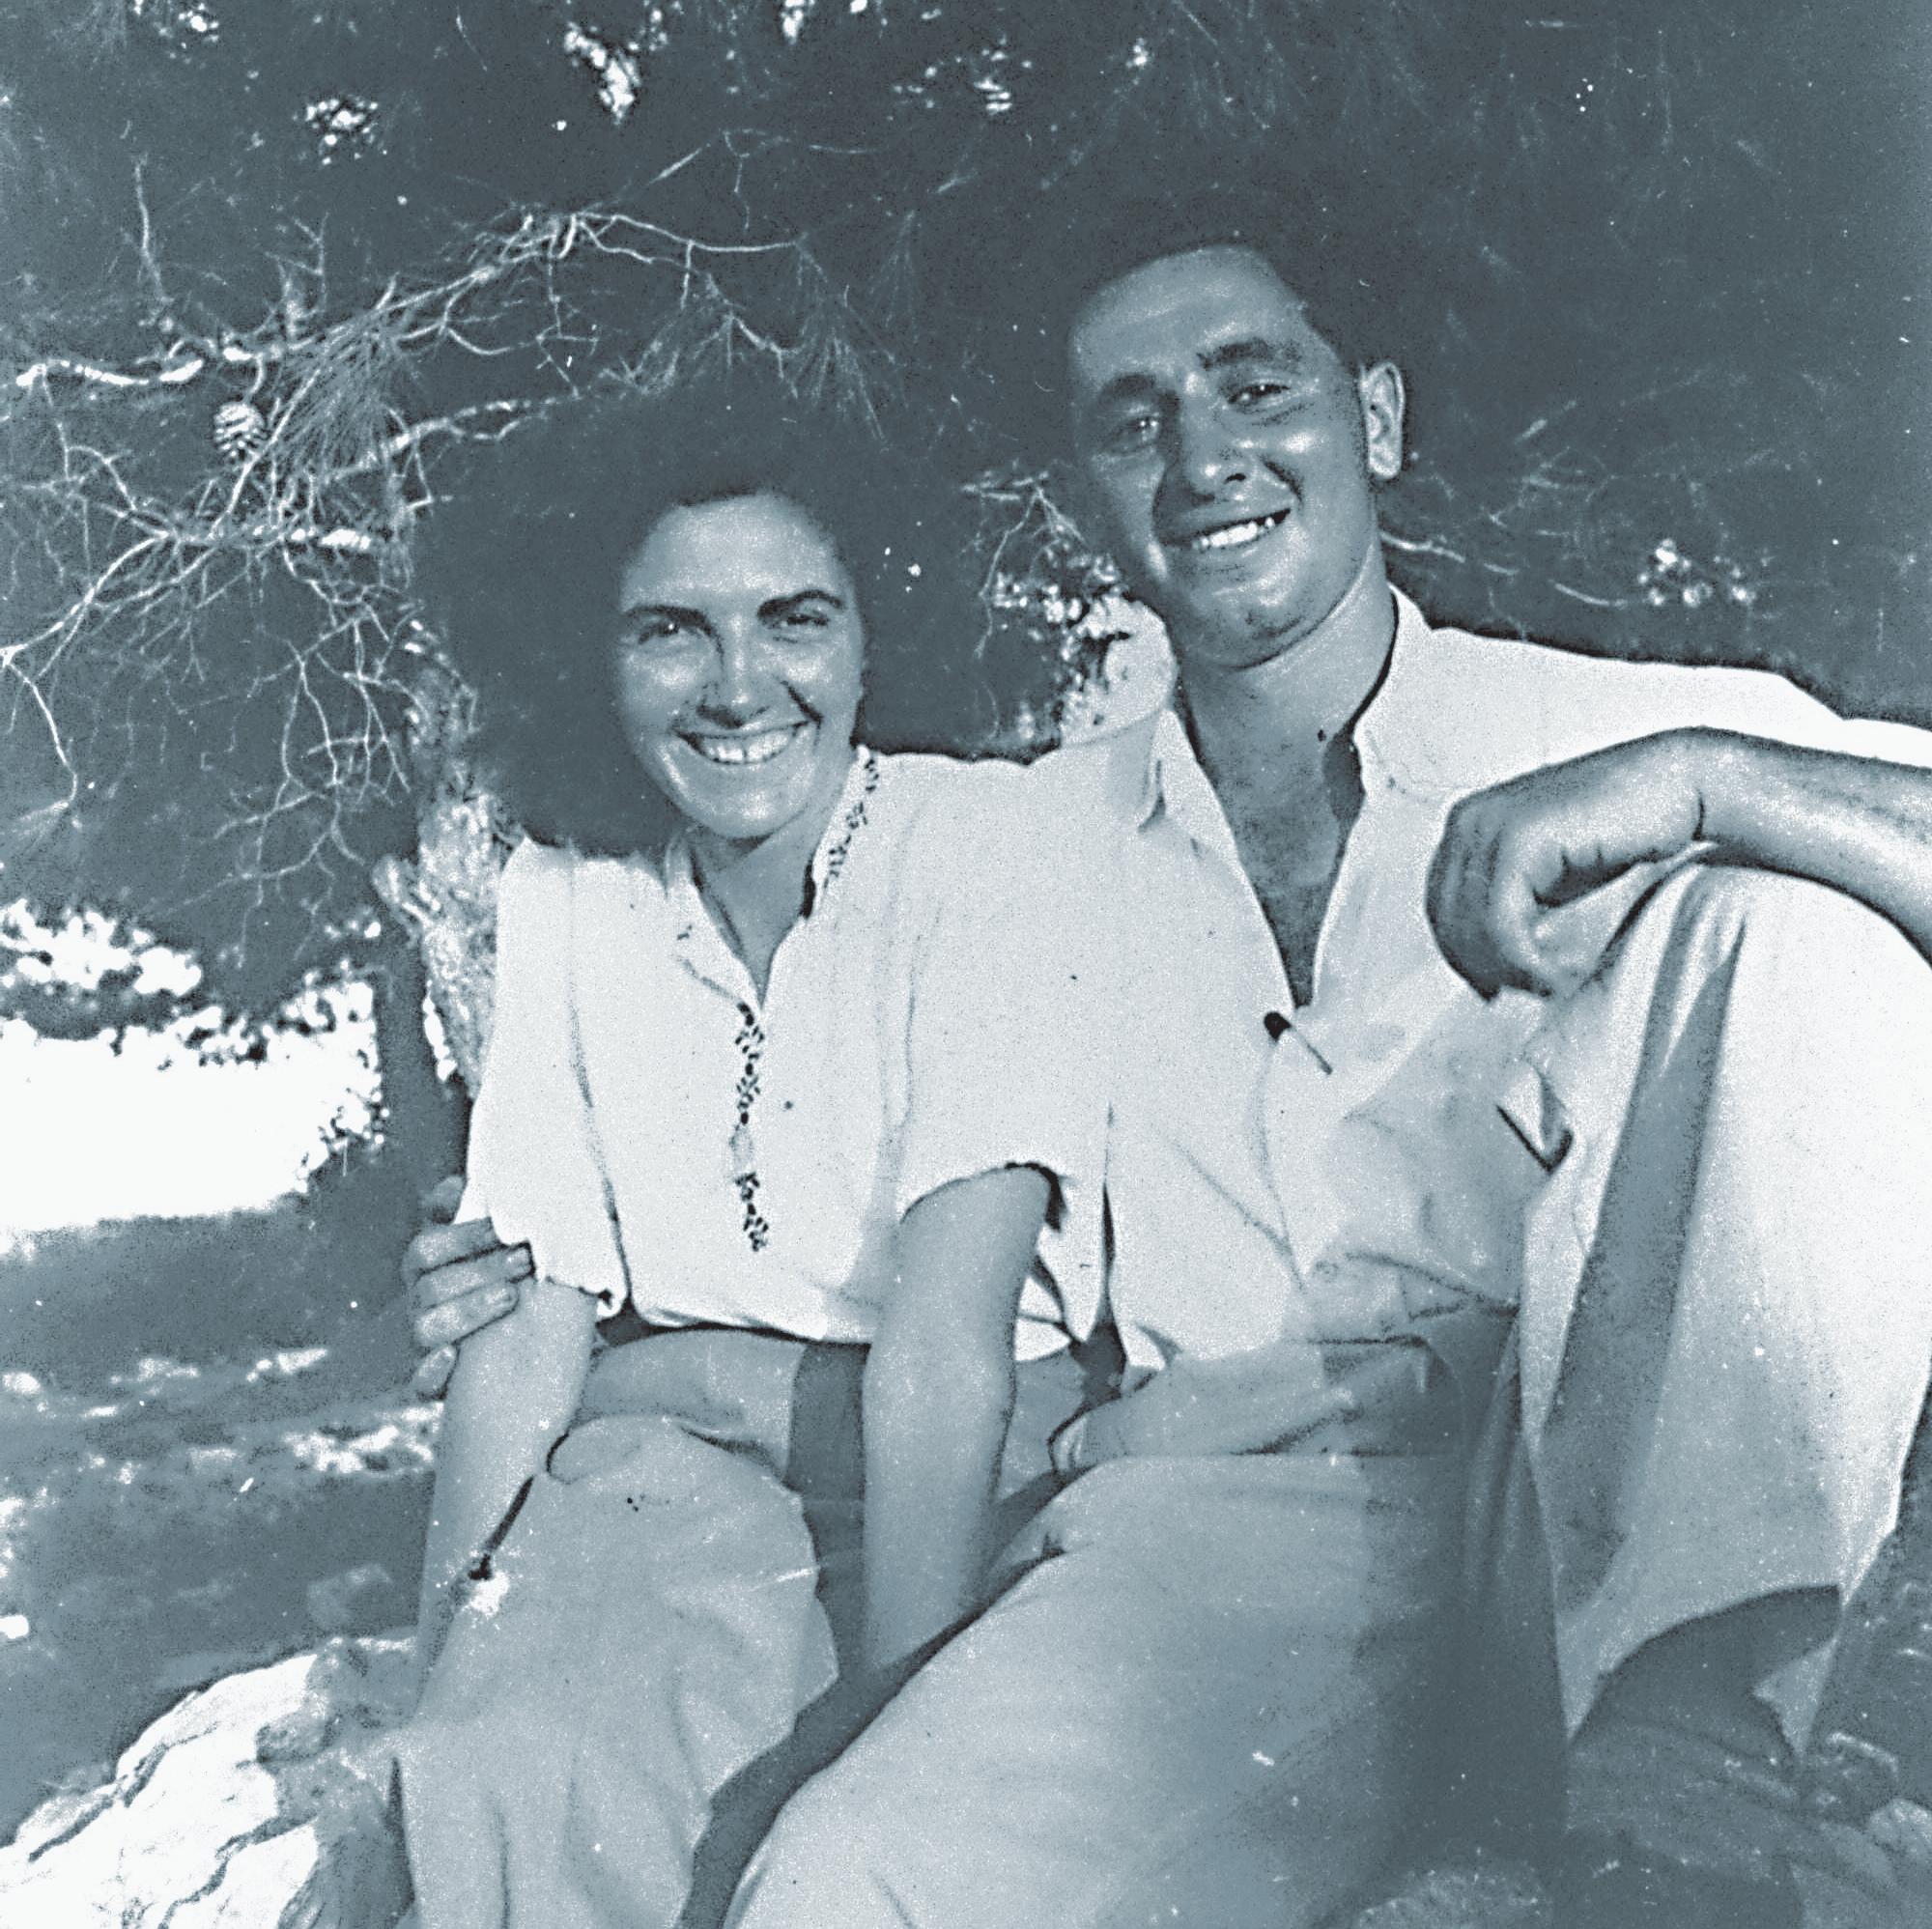 עם סוניה, כזוג צעיר